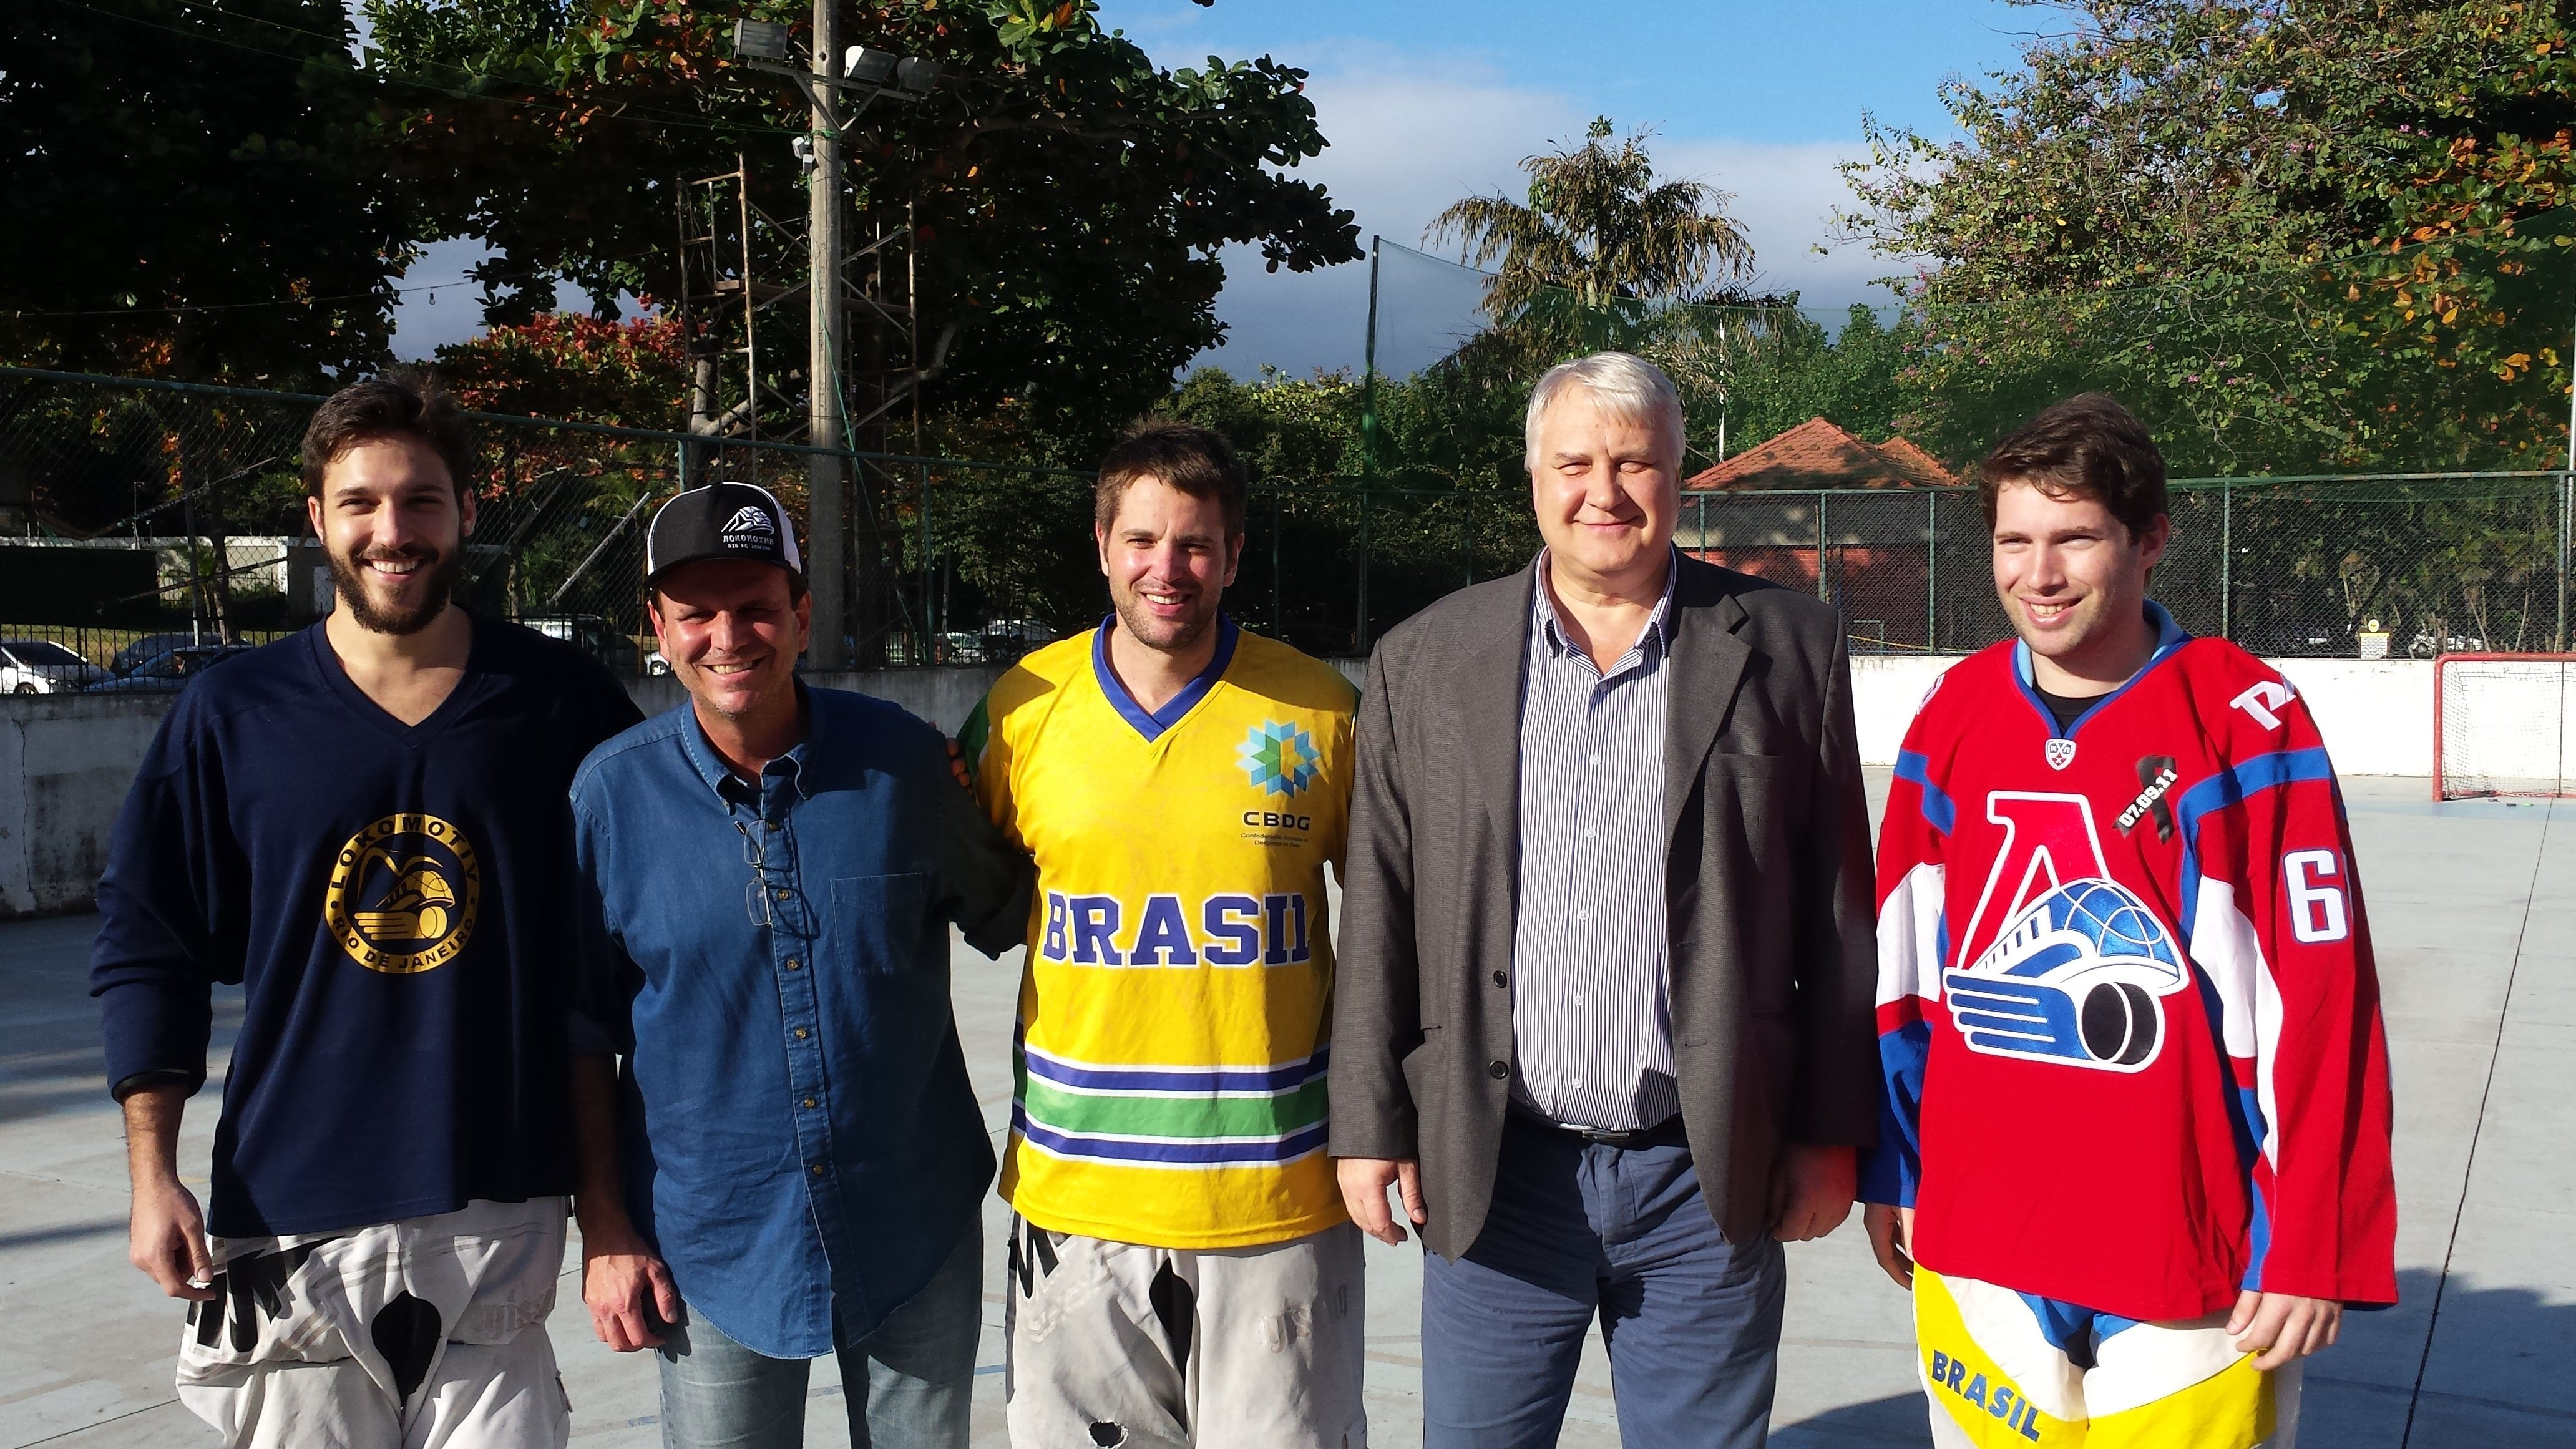 Julio Baptista, Eduardo Paes, Jens Hinderlie, Vladimir Tokmakov e Daniel Baptista